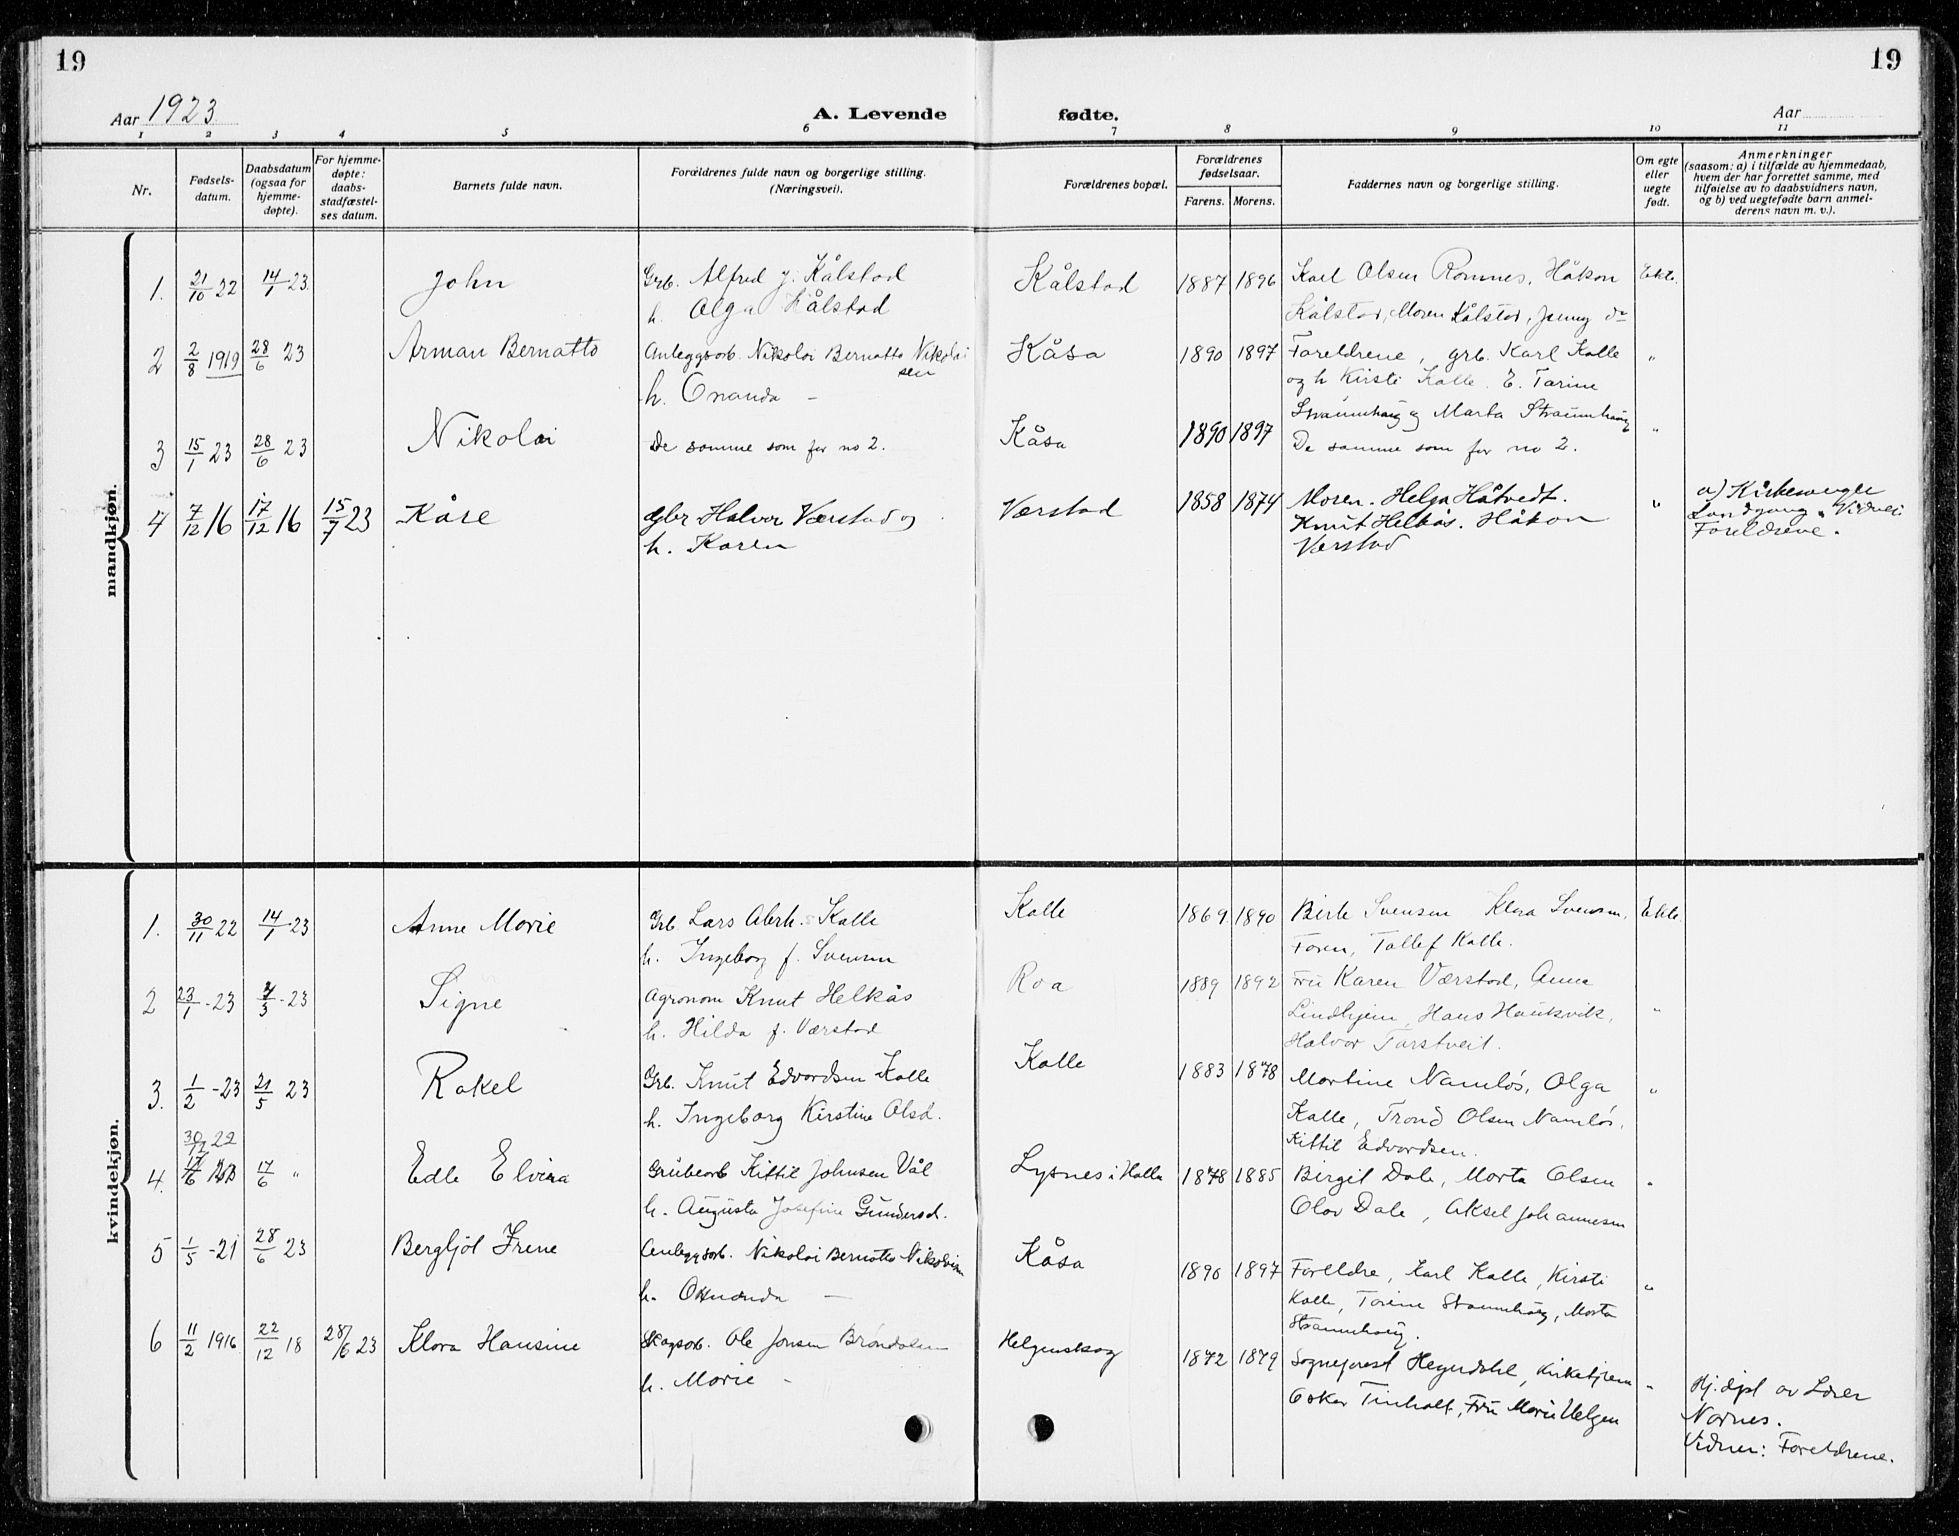 SAKO, Holla kirkebøker, G/Gb/L0003: Klokkerbok nr. II 3, 1914-1941, s. 19